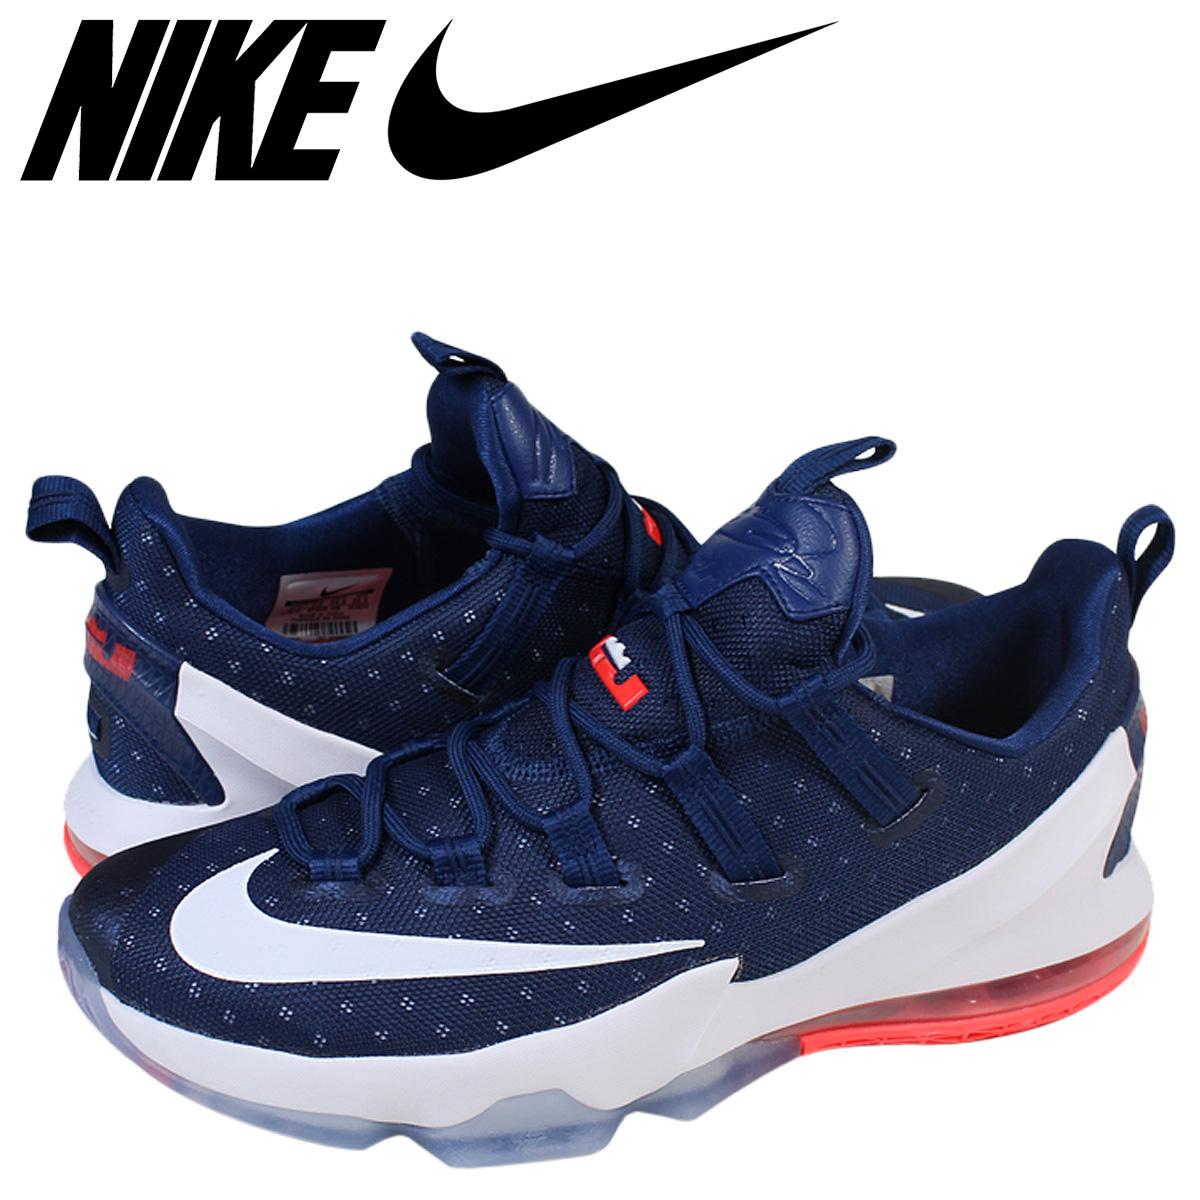 lowest price a5263 84558 Nike NIKE Revlon sneakers men LEBRON 13 LOW EP 831,925-416 navy